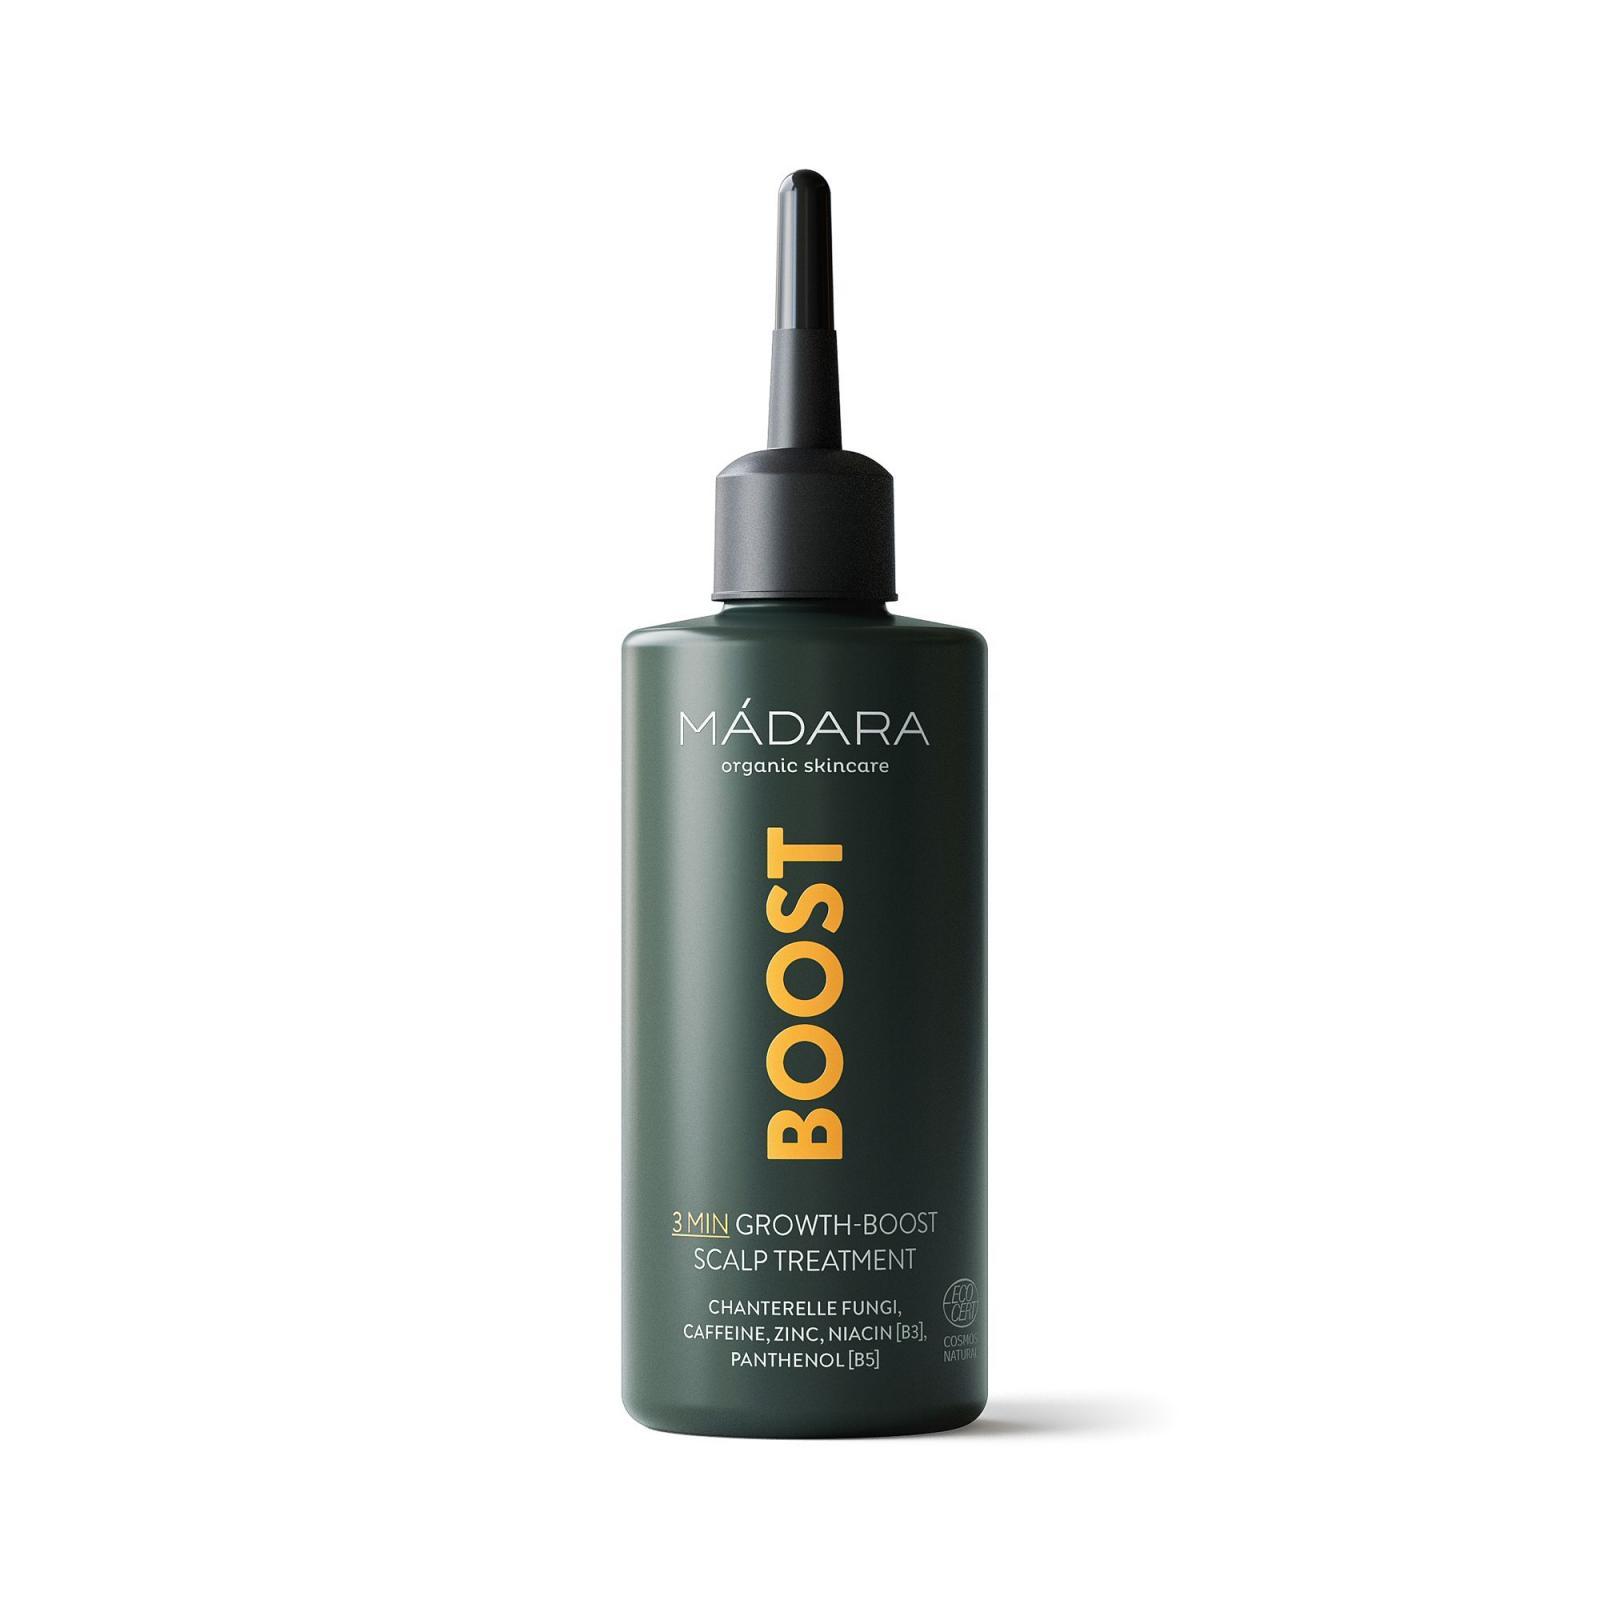 MÁDARA 3 minutové sérum pro růst vlasů 100 ml